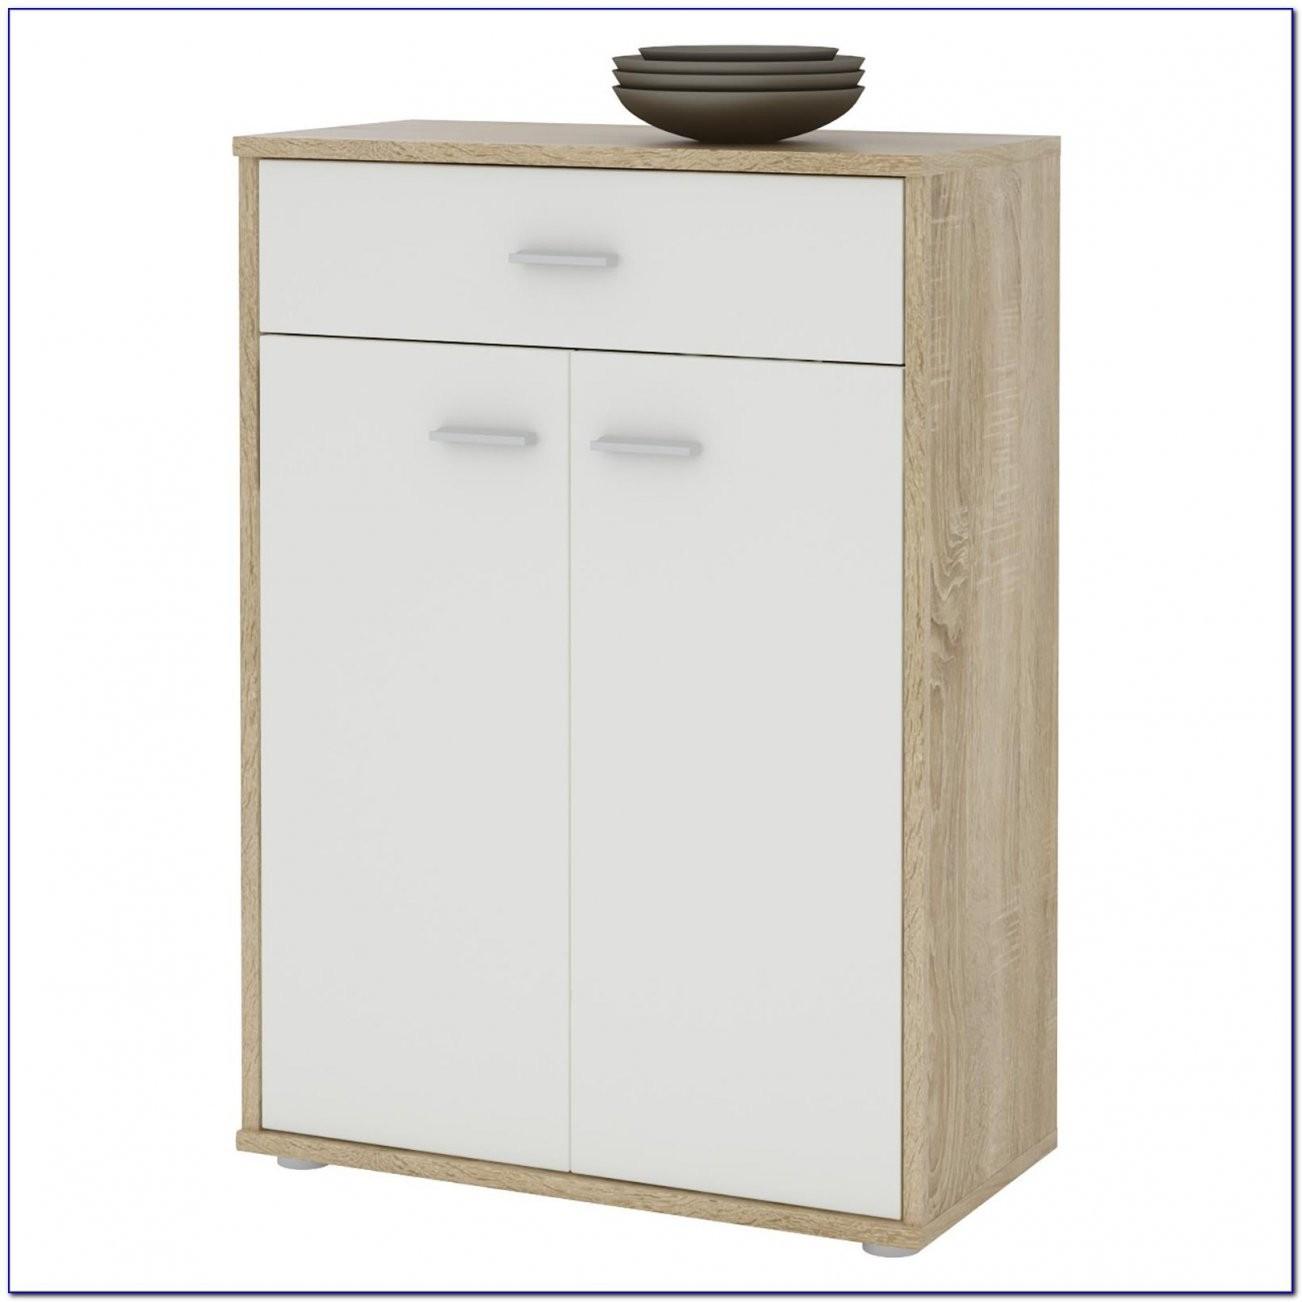 Ikea Schrank 40 Cm Tief Kommode 60 Cm Breite 40 Cm Tief Kommoden von Schrank 60 Cm Breit Ikea Bild